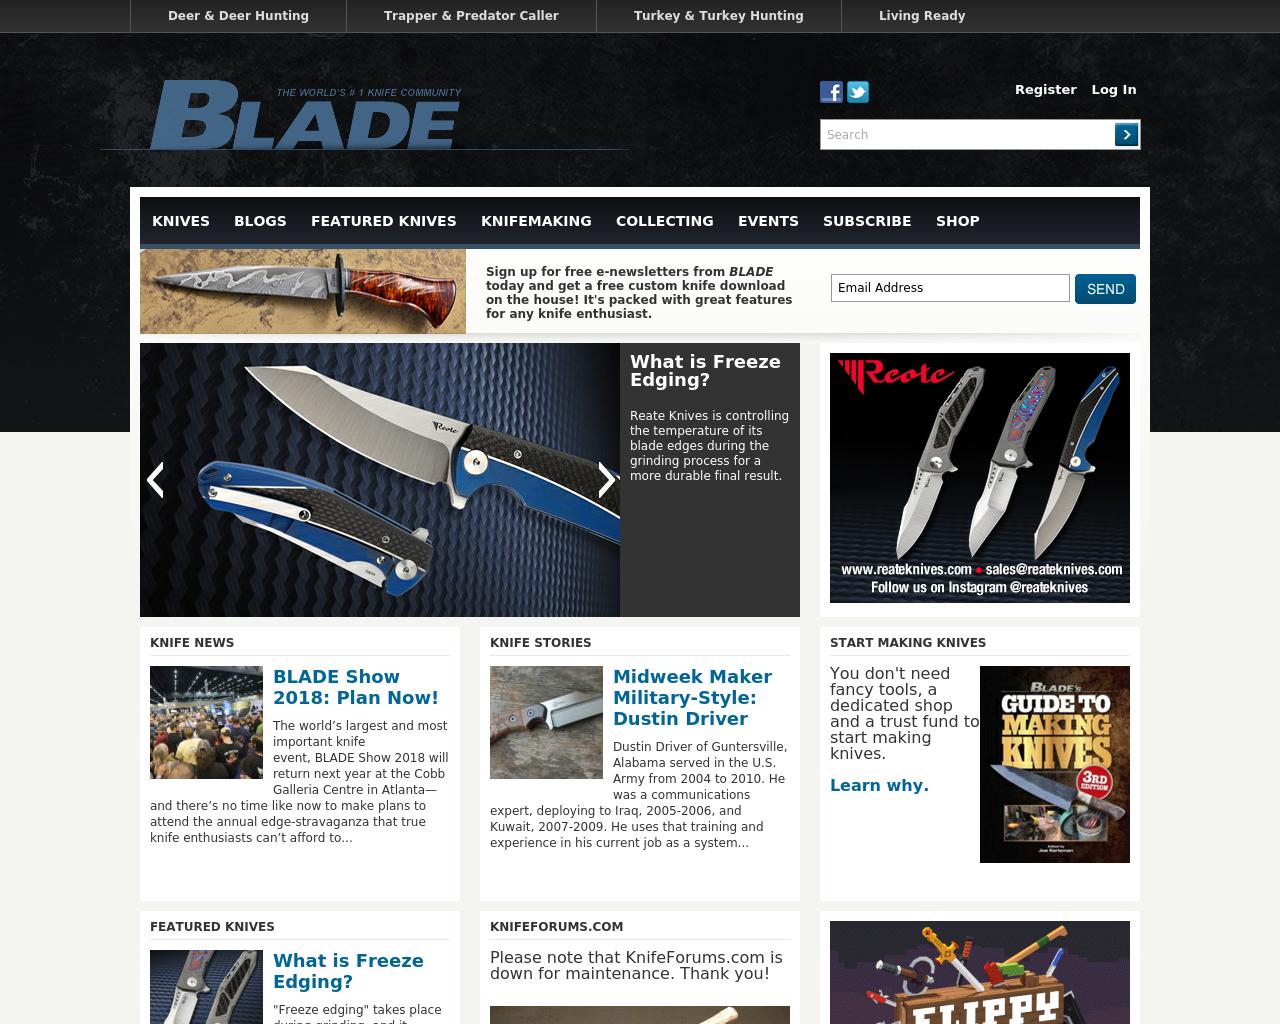 BLADE-Advertising-Reviews-Pricing